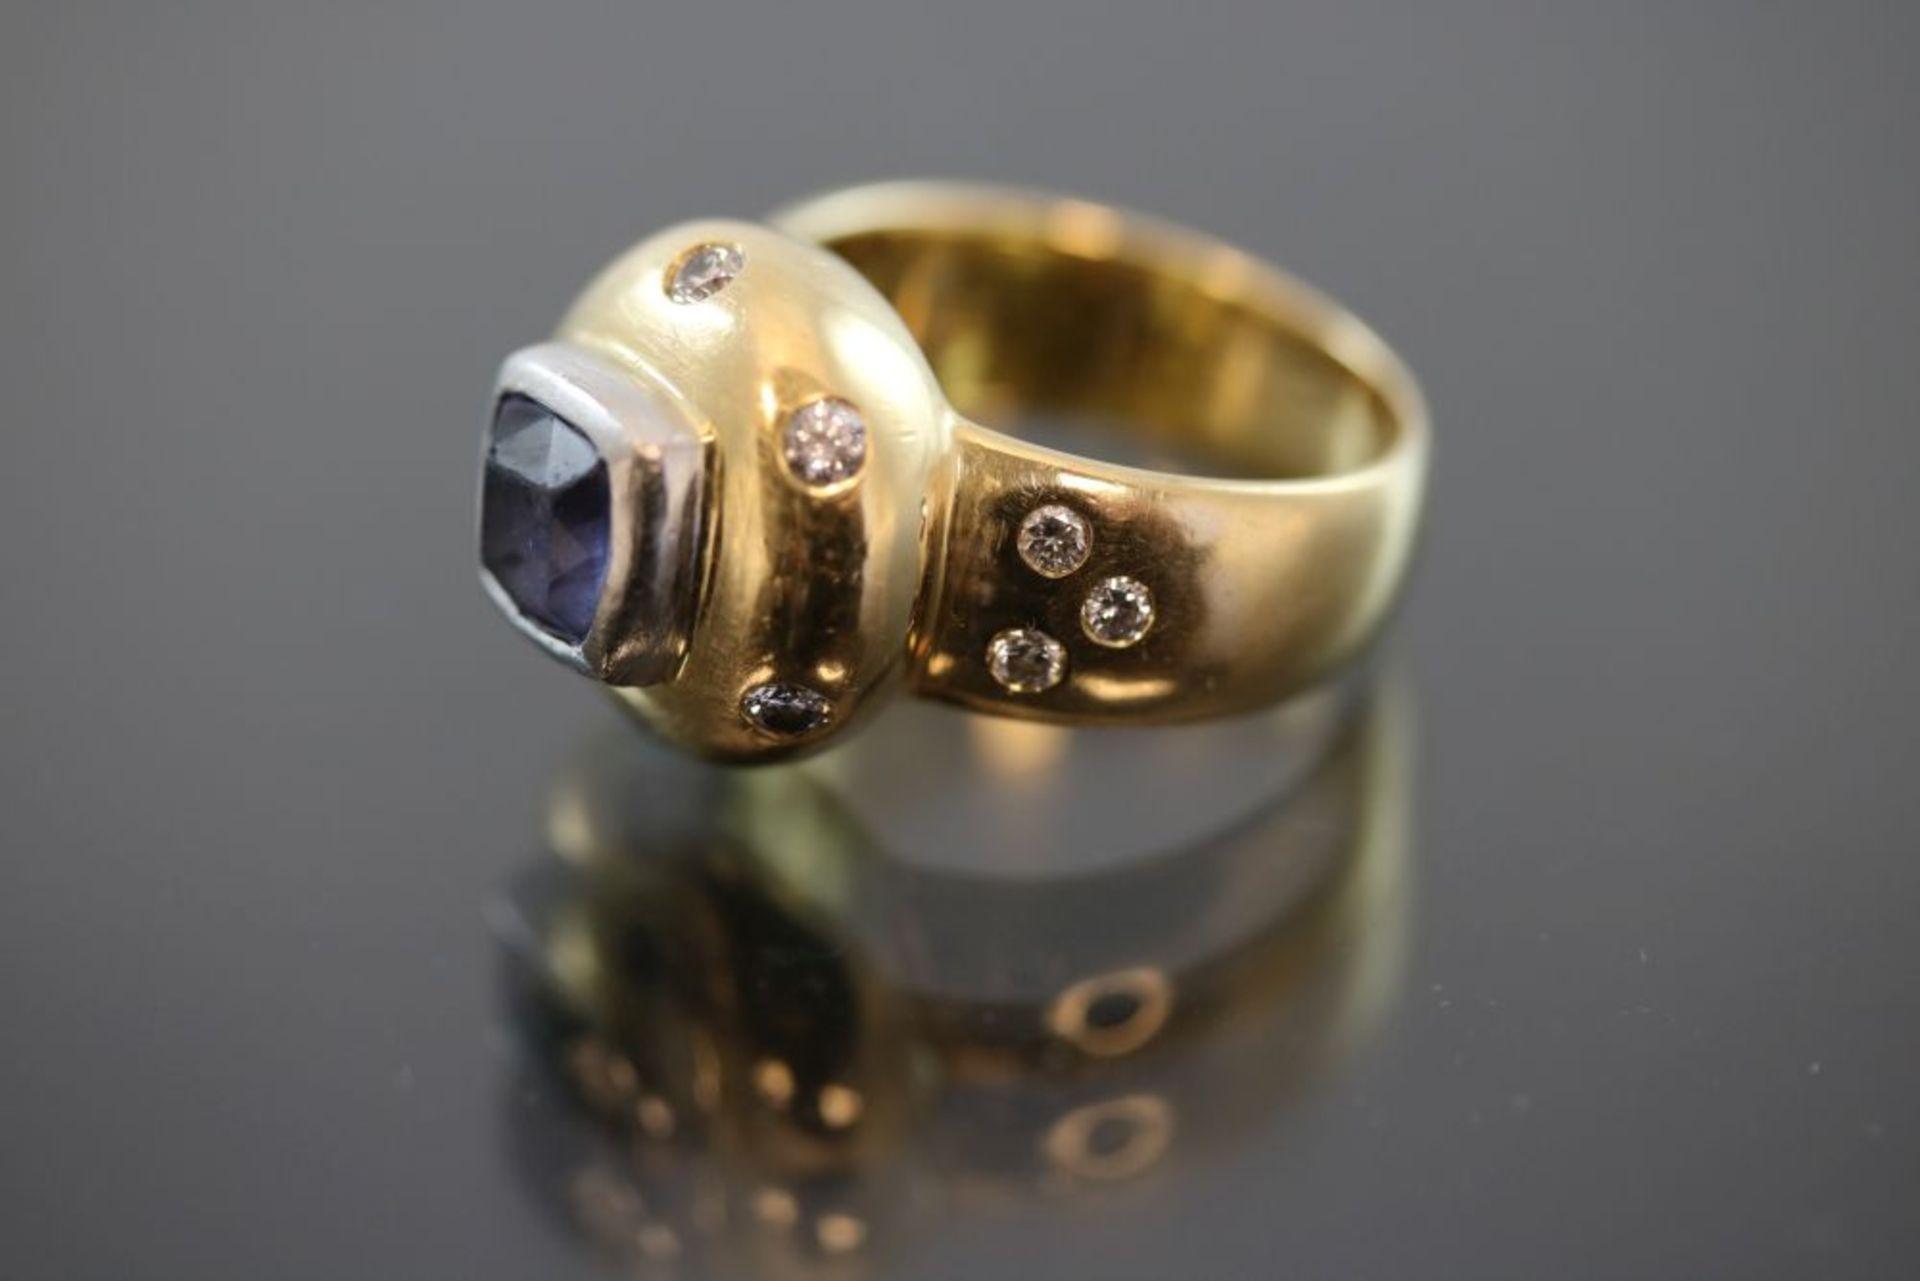 Tanzanit-Brillant-Ring, 750 Gold - Bild 2 aus 3